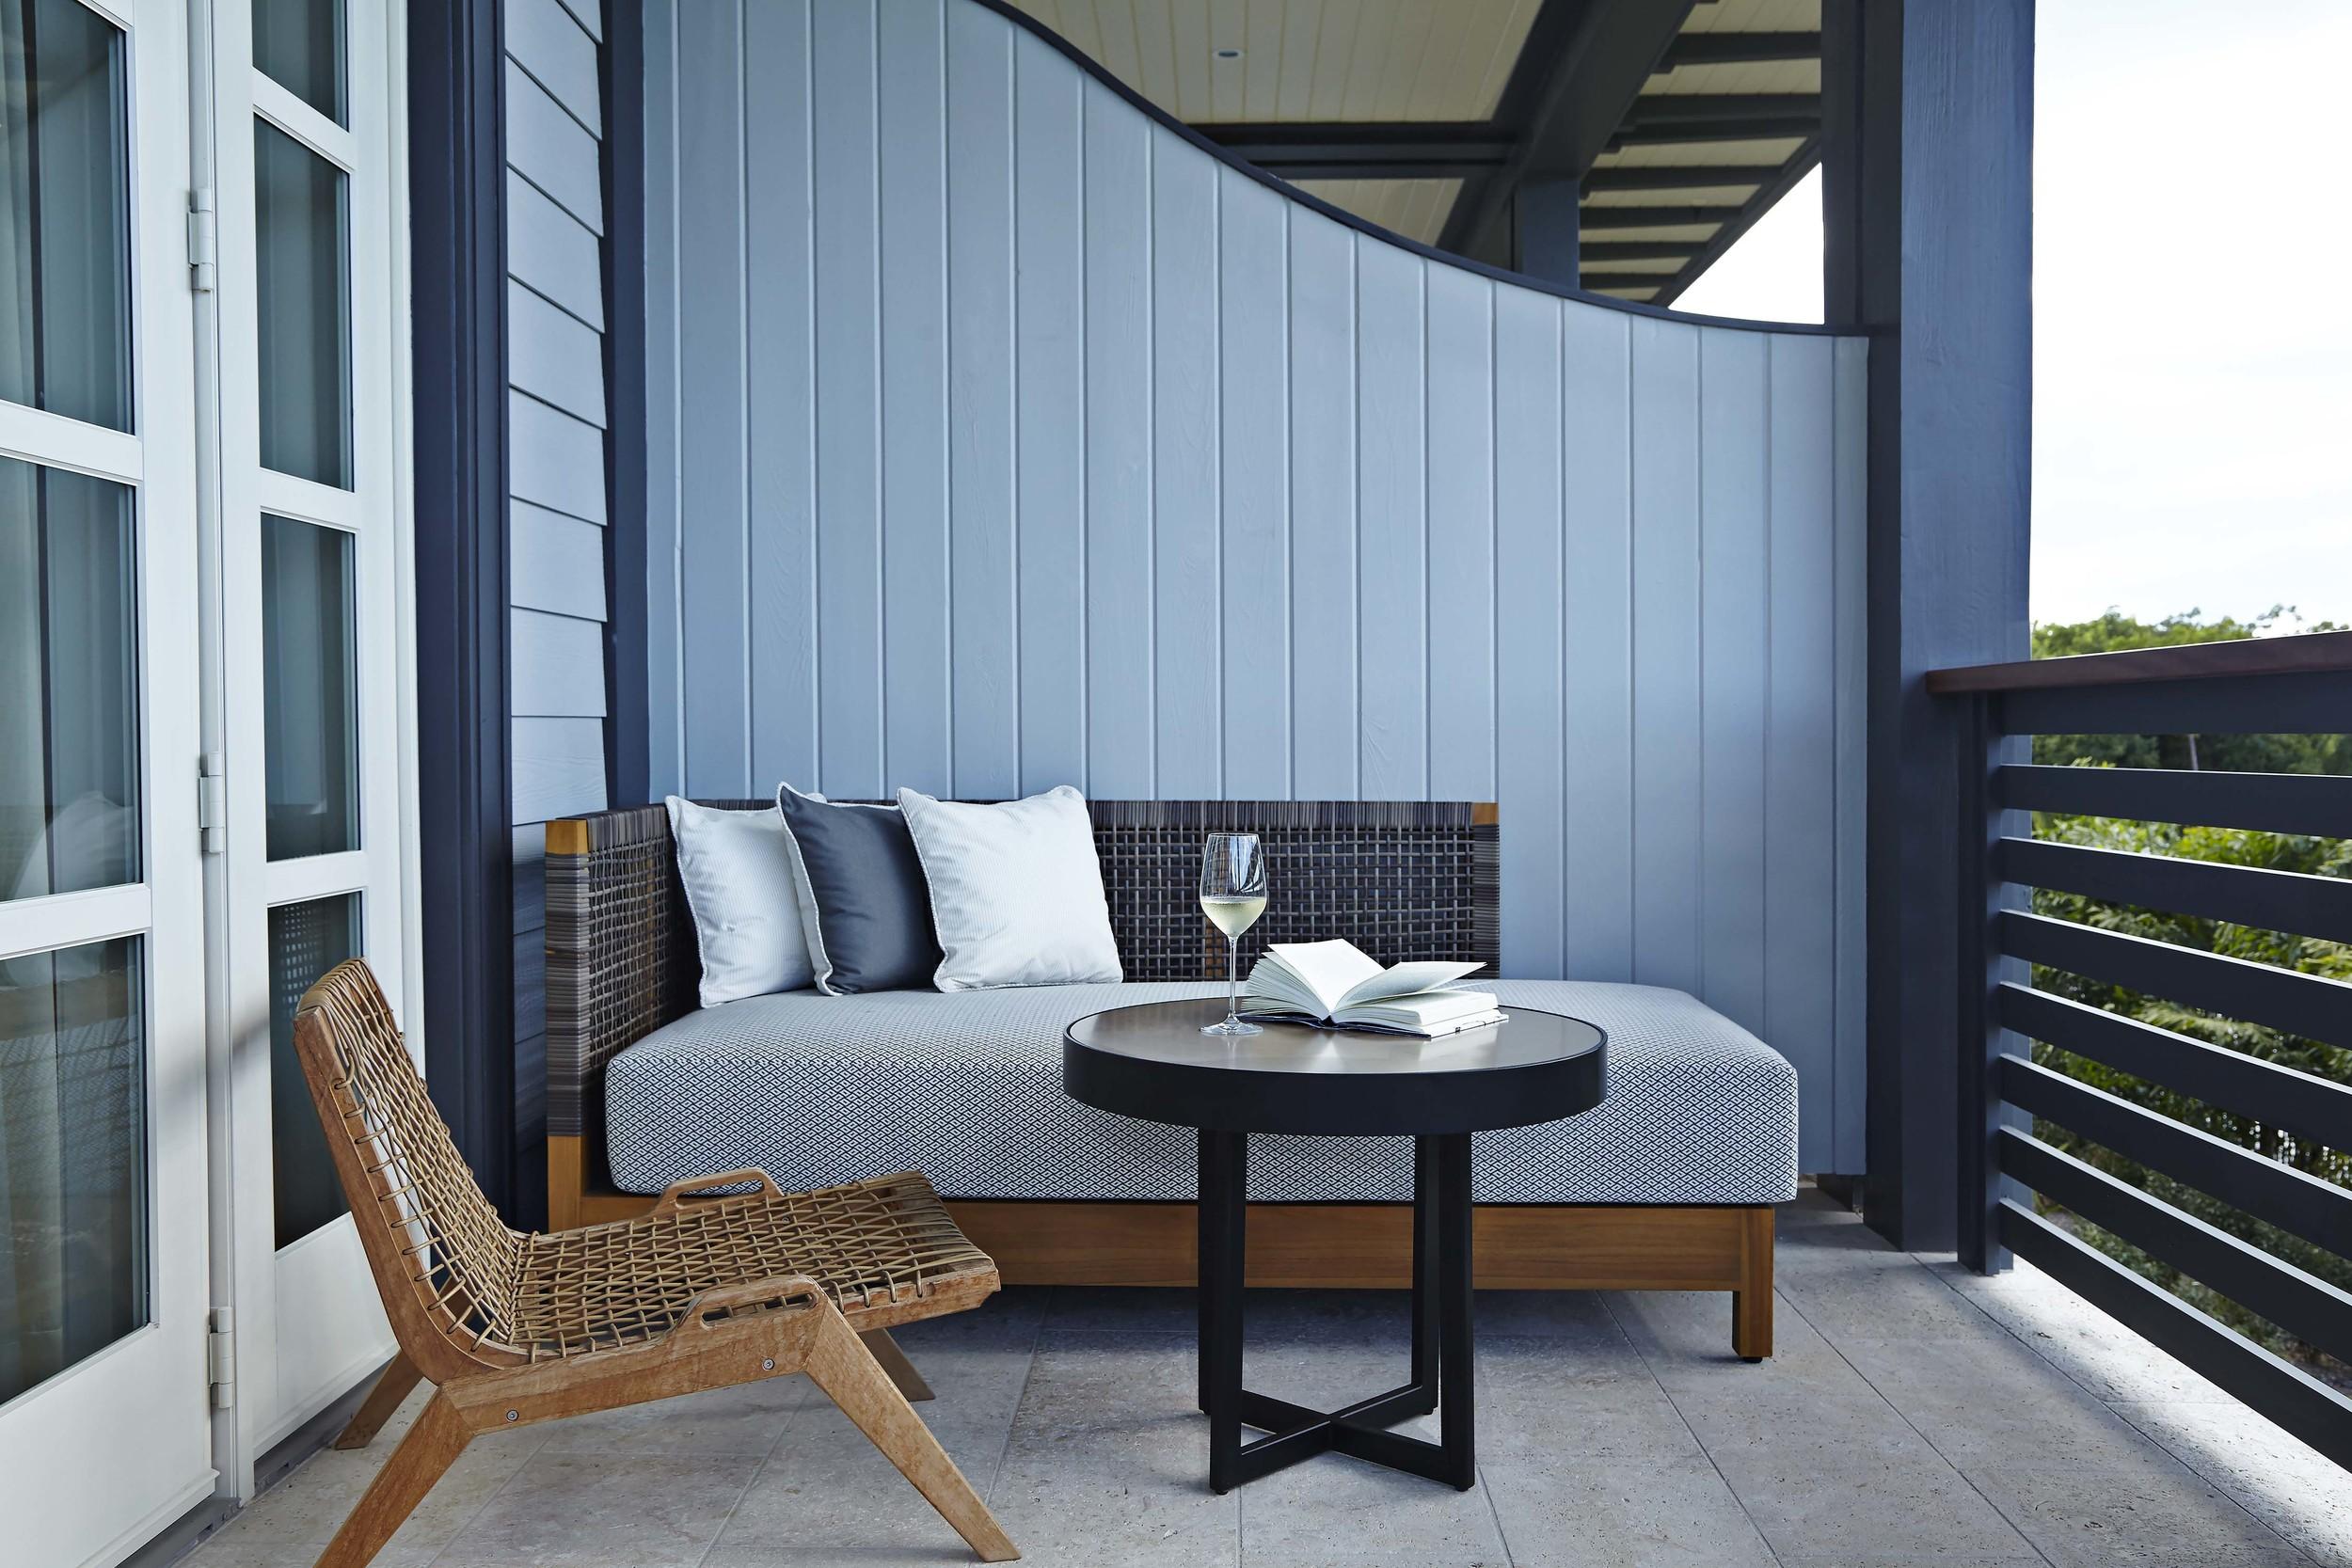 Island_House_Oceanview_Room_Balcony2.jpg